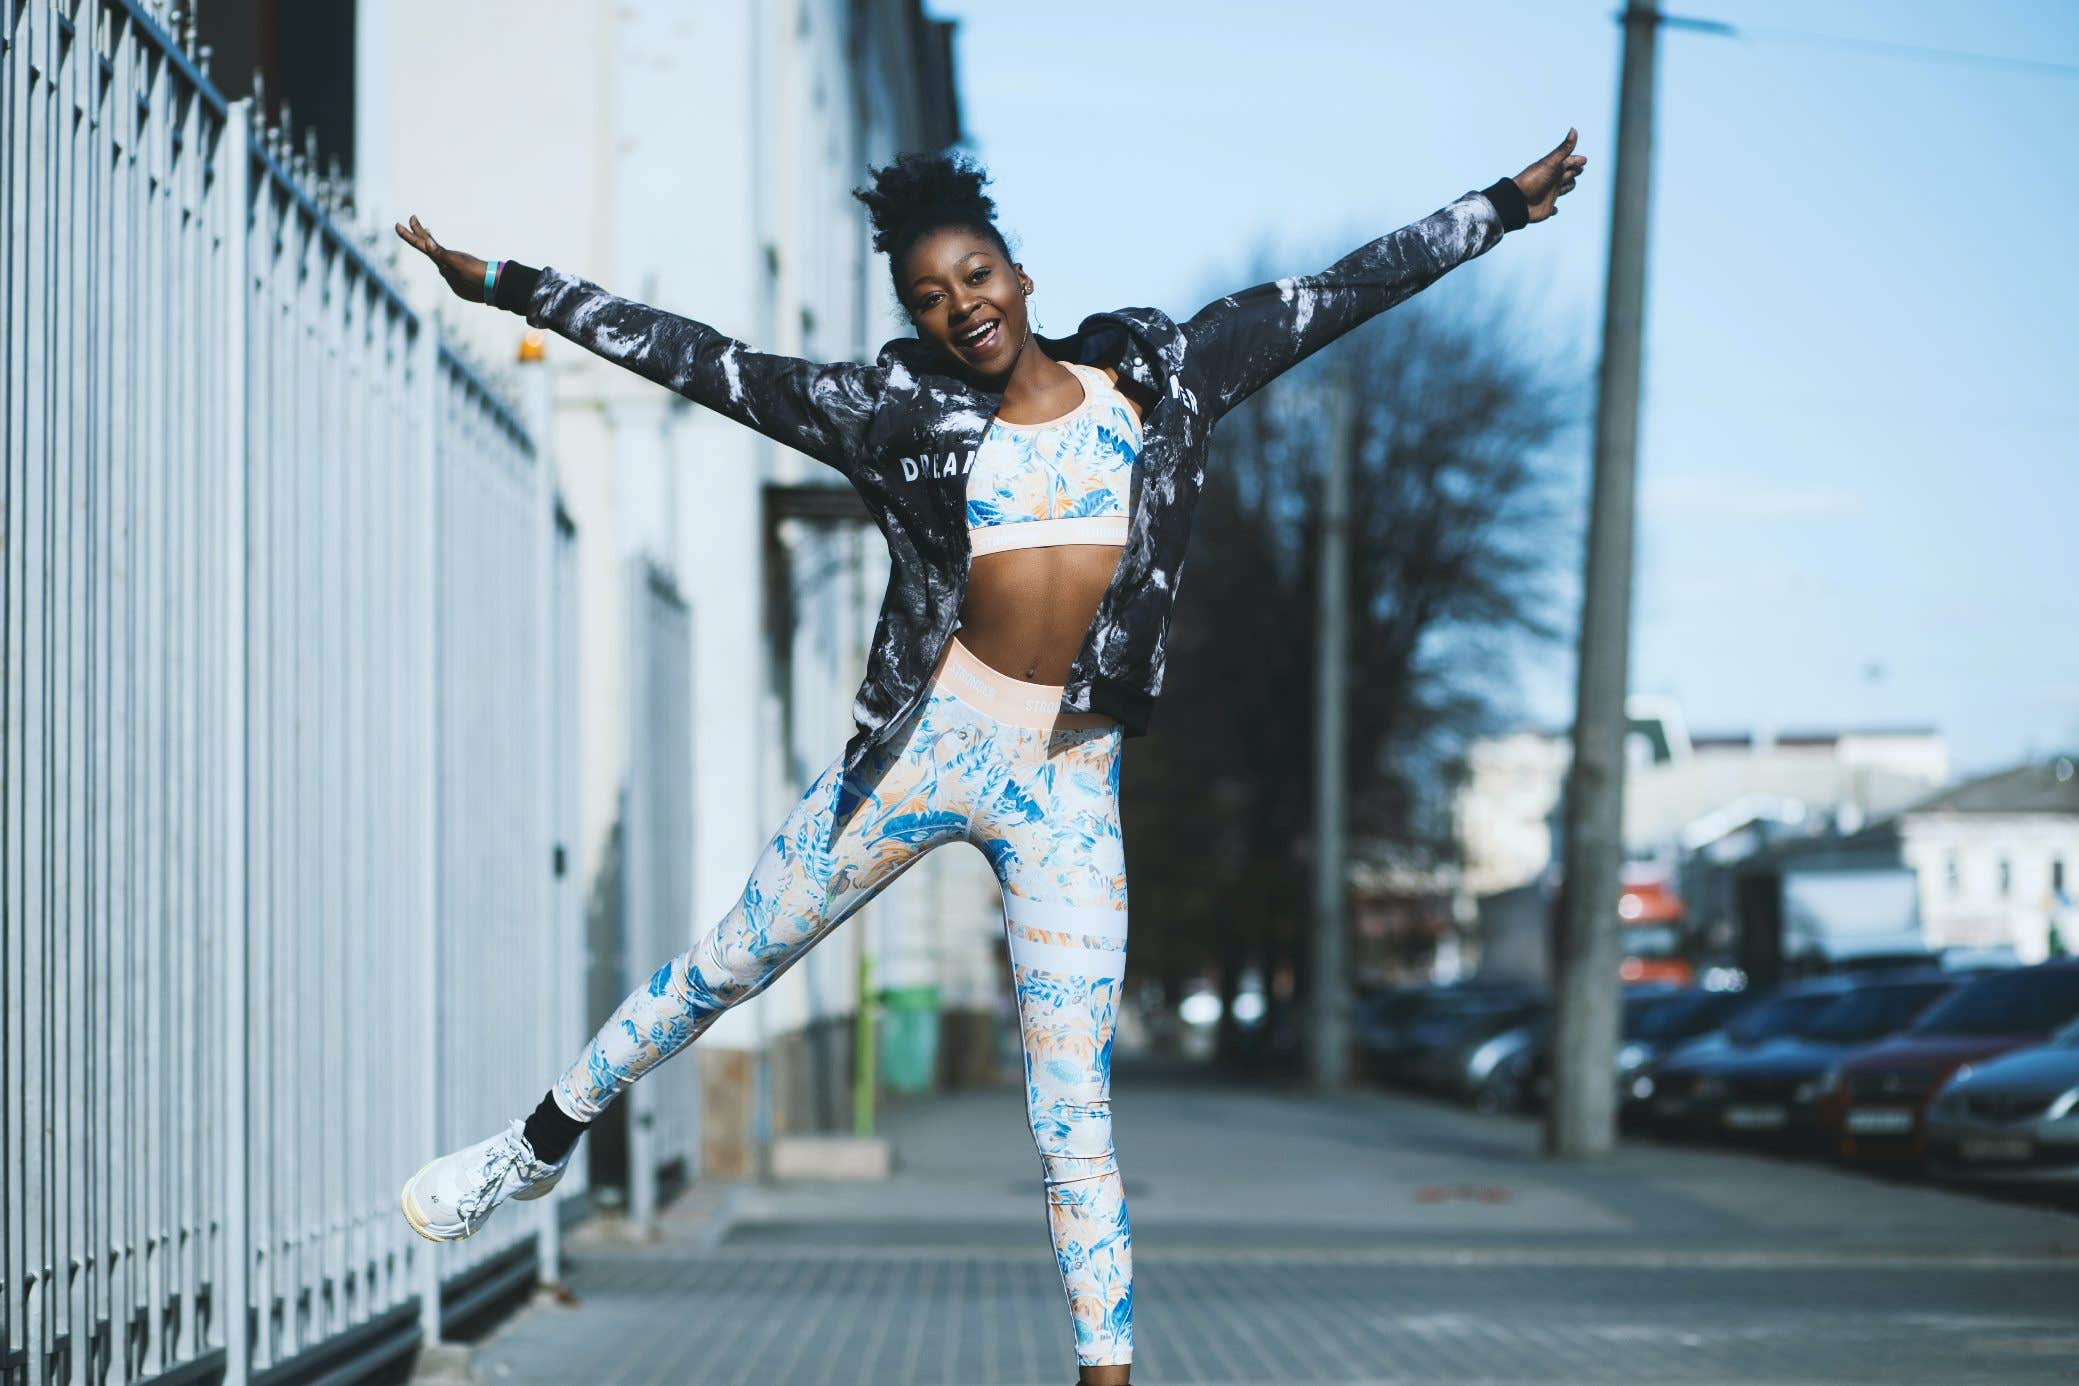 Black young woman jump vitality joy